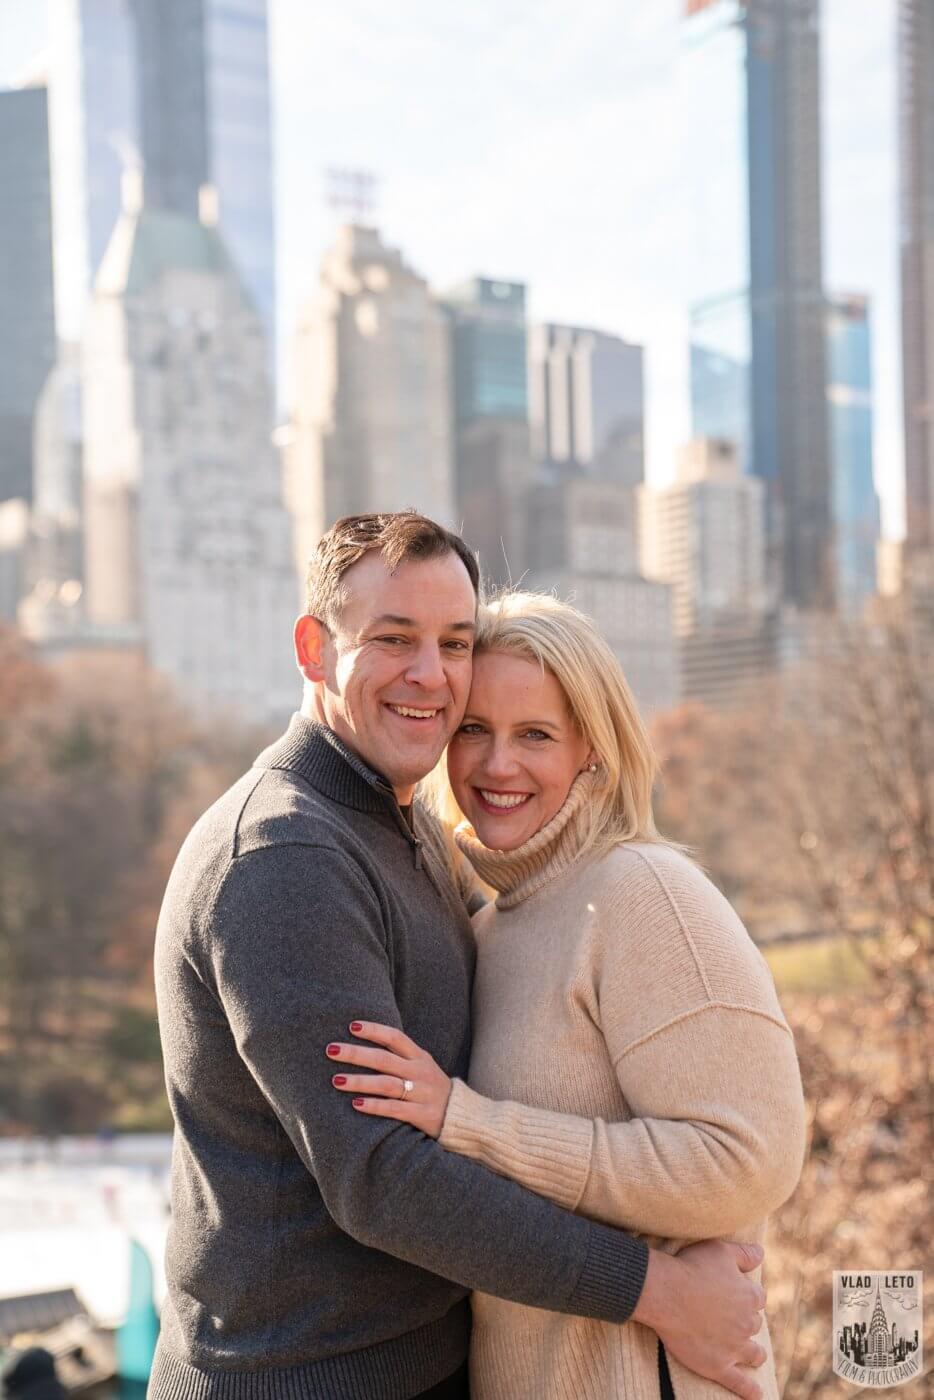 Photo 13 Central Park Wedding proposal | VladLeto